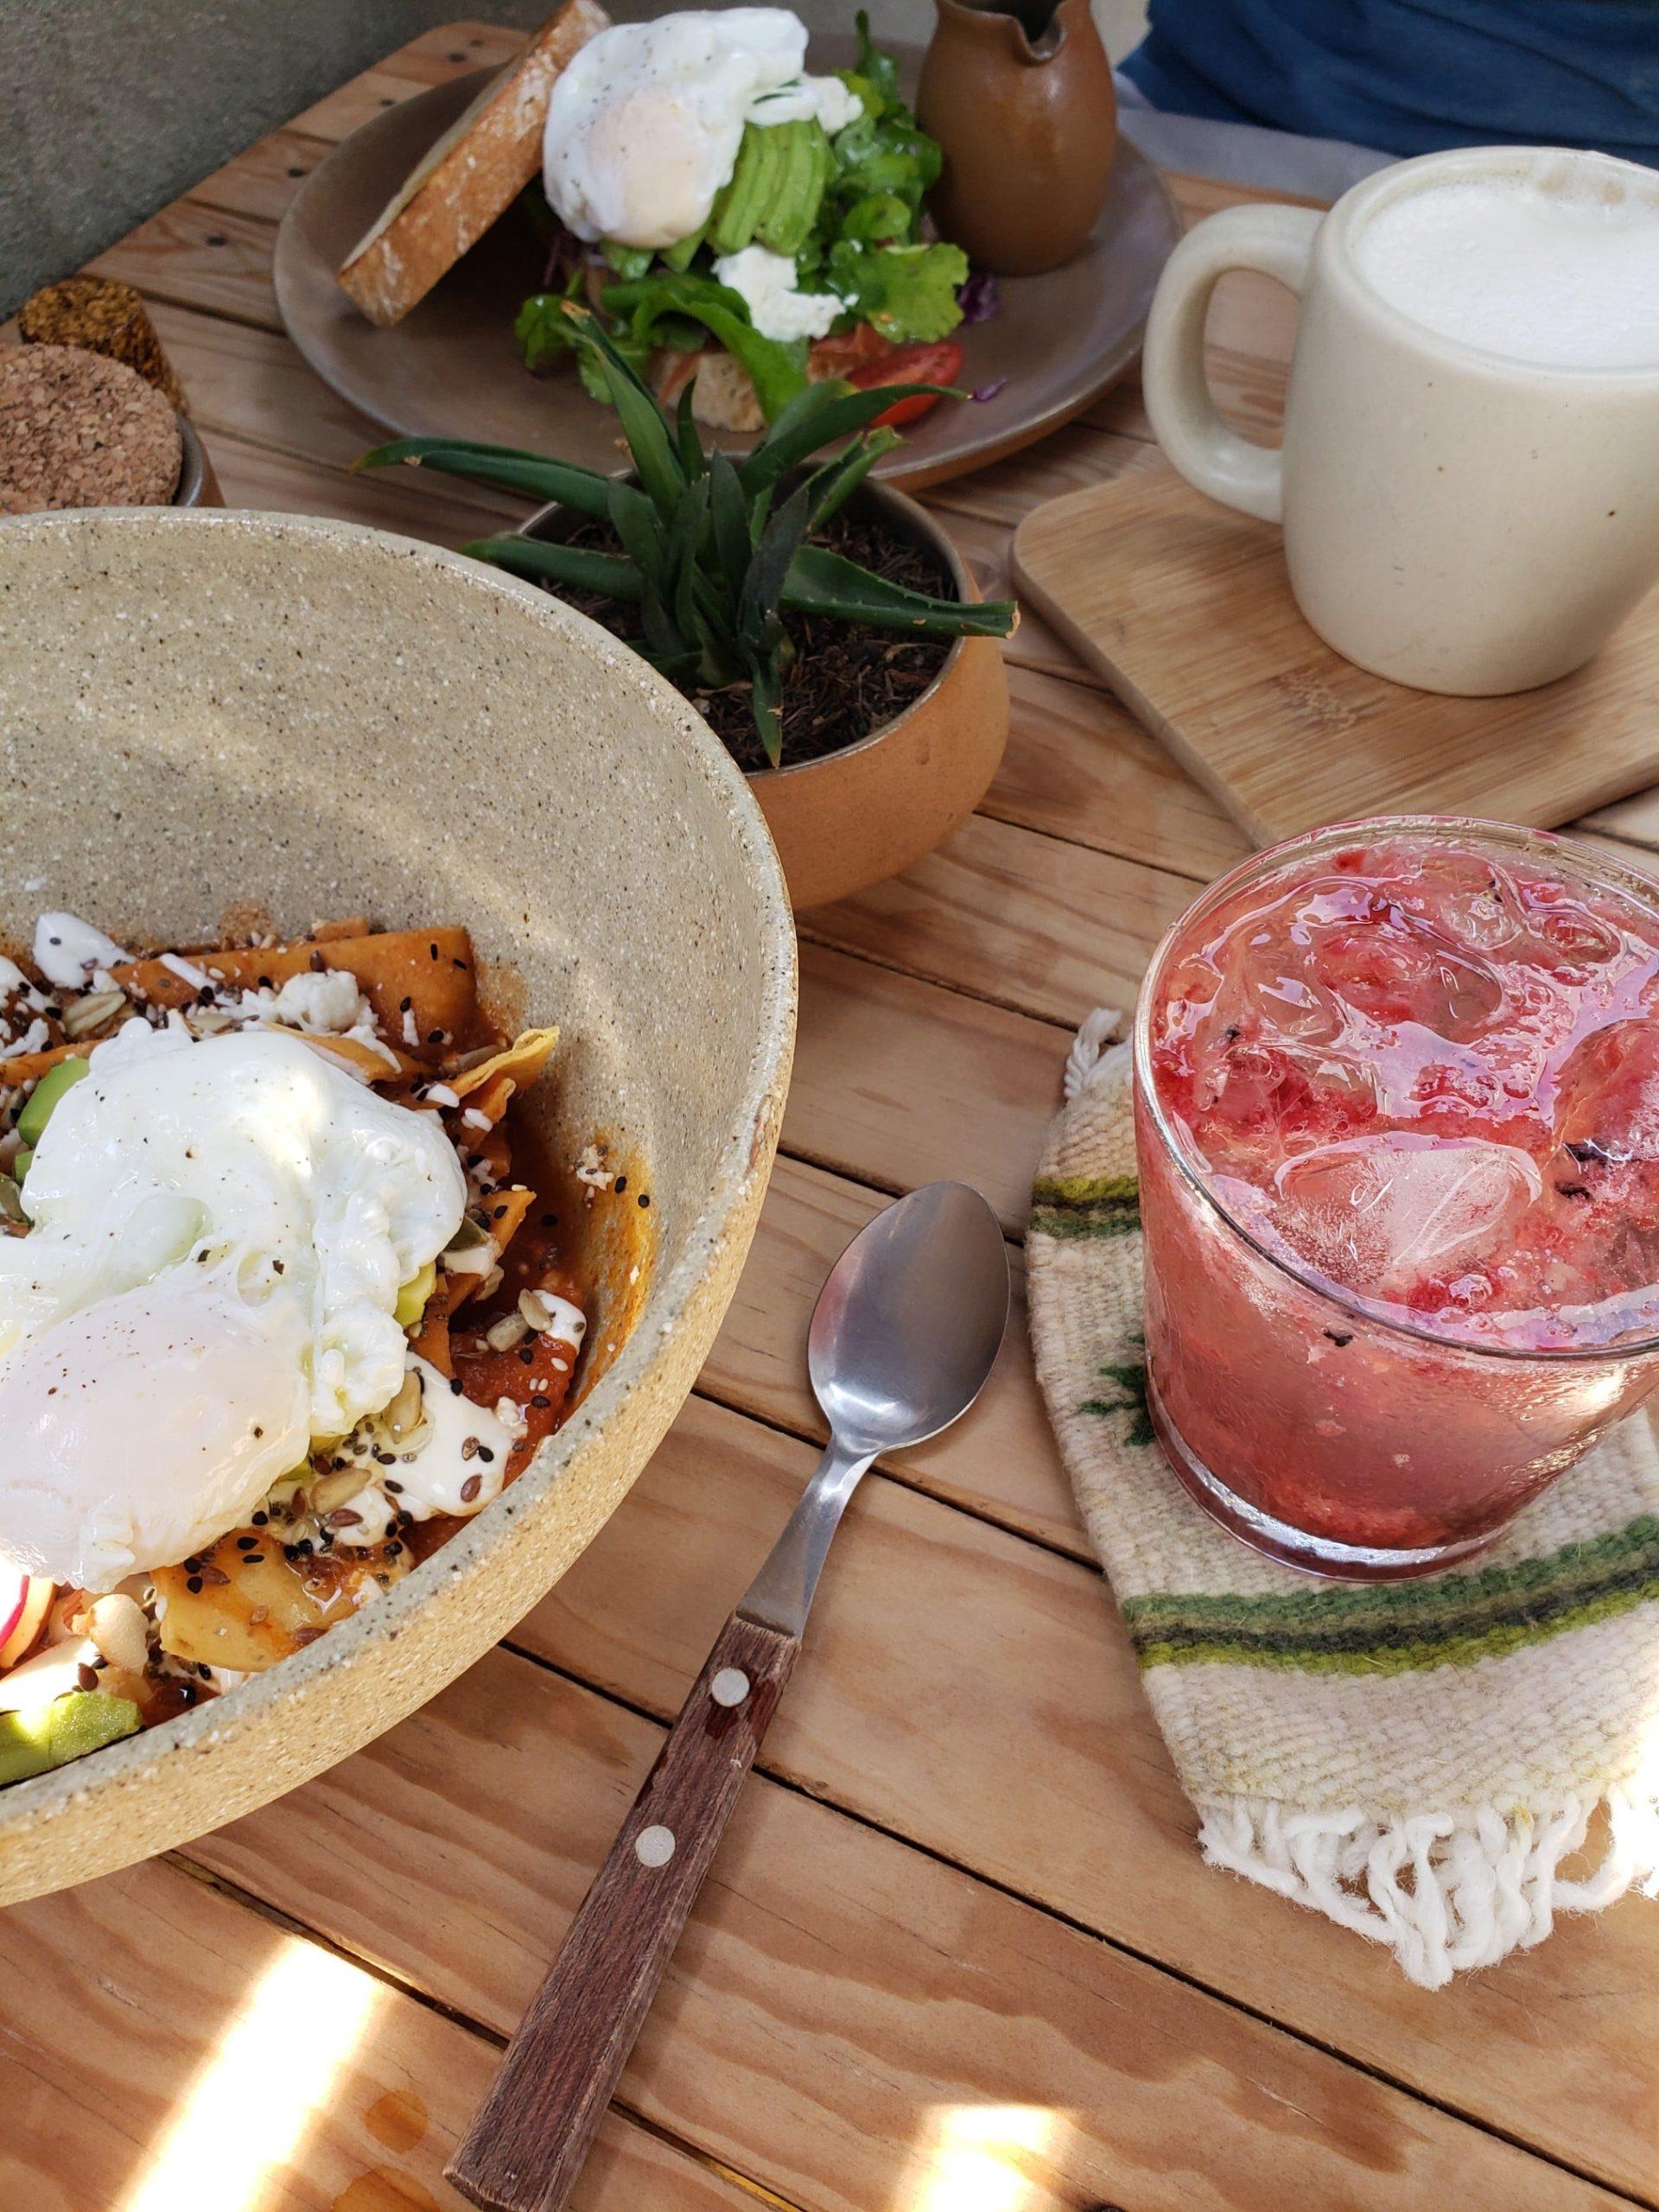 7 Best Breakfast and Brunch Spots in Sayulita, Mexico #sayulita #mexico | Read the blog: www.bucketlistbri.com